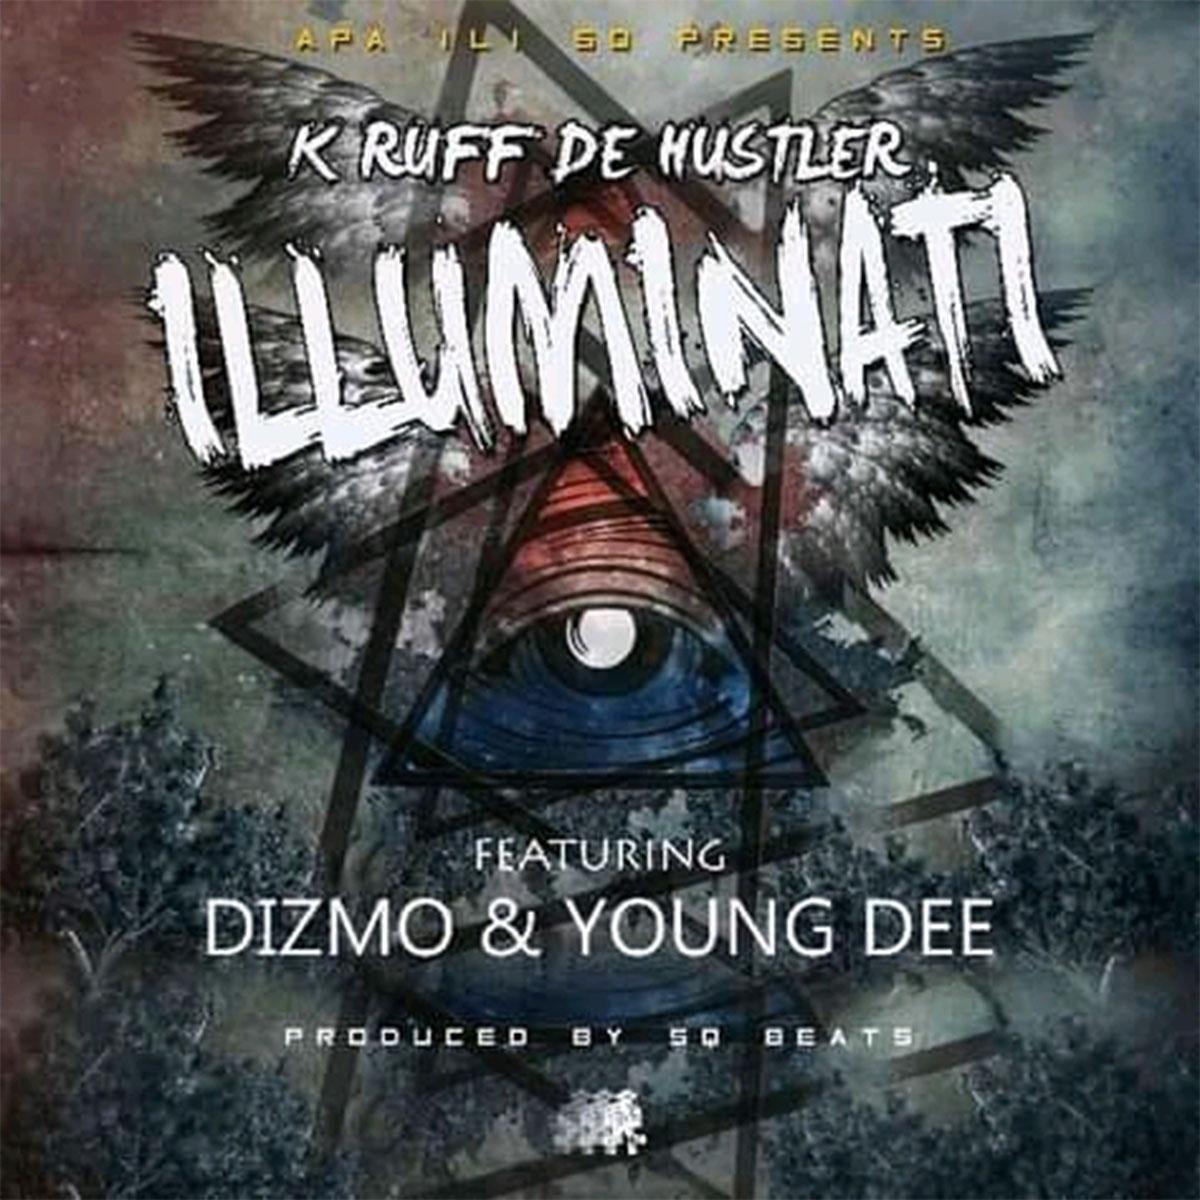 K Ruff De Hustler ft. Dizmo & Young Dee - Illuminati